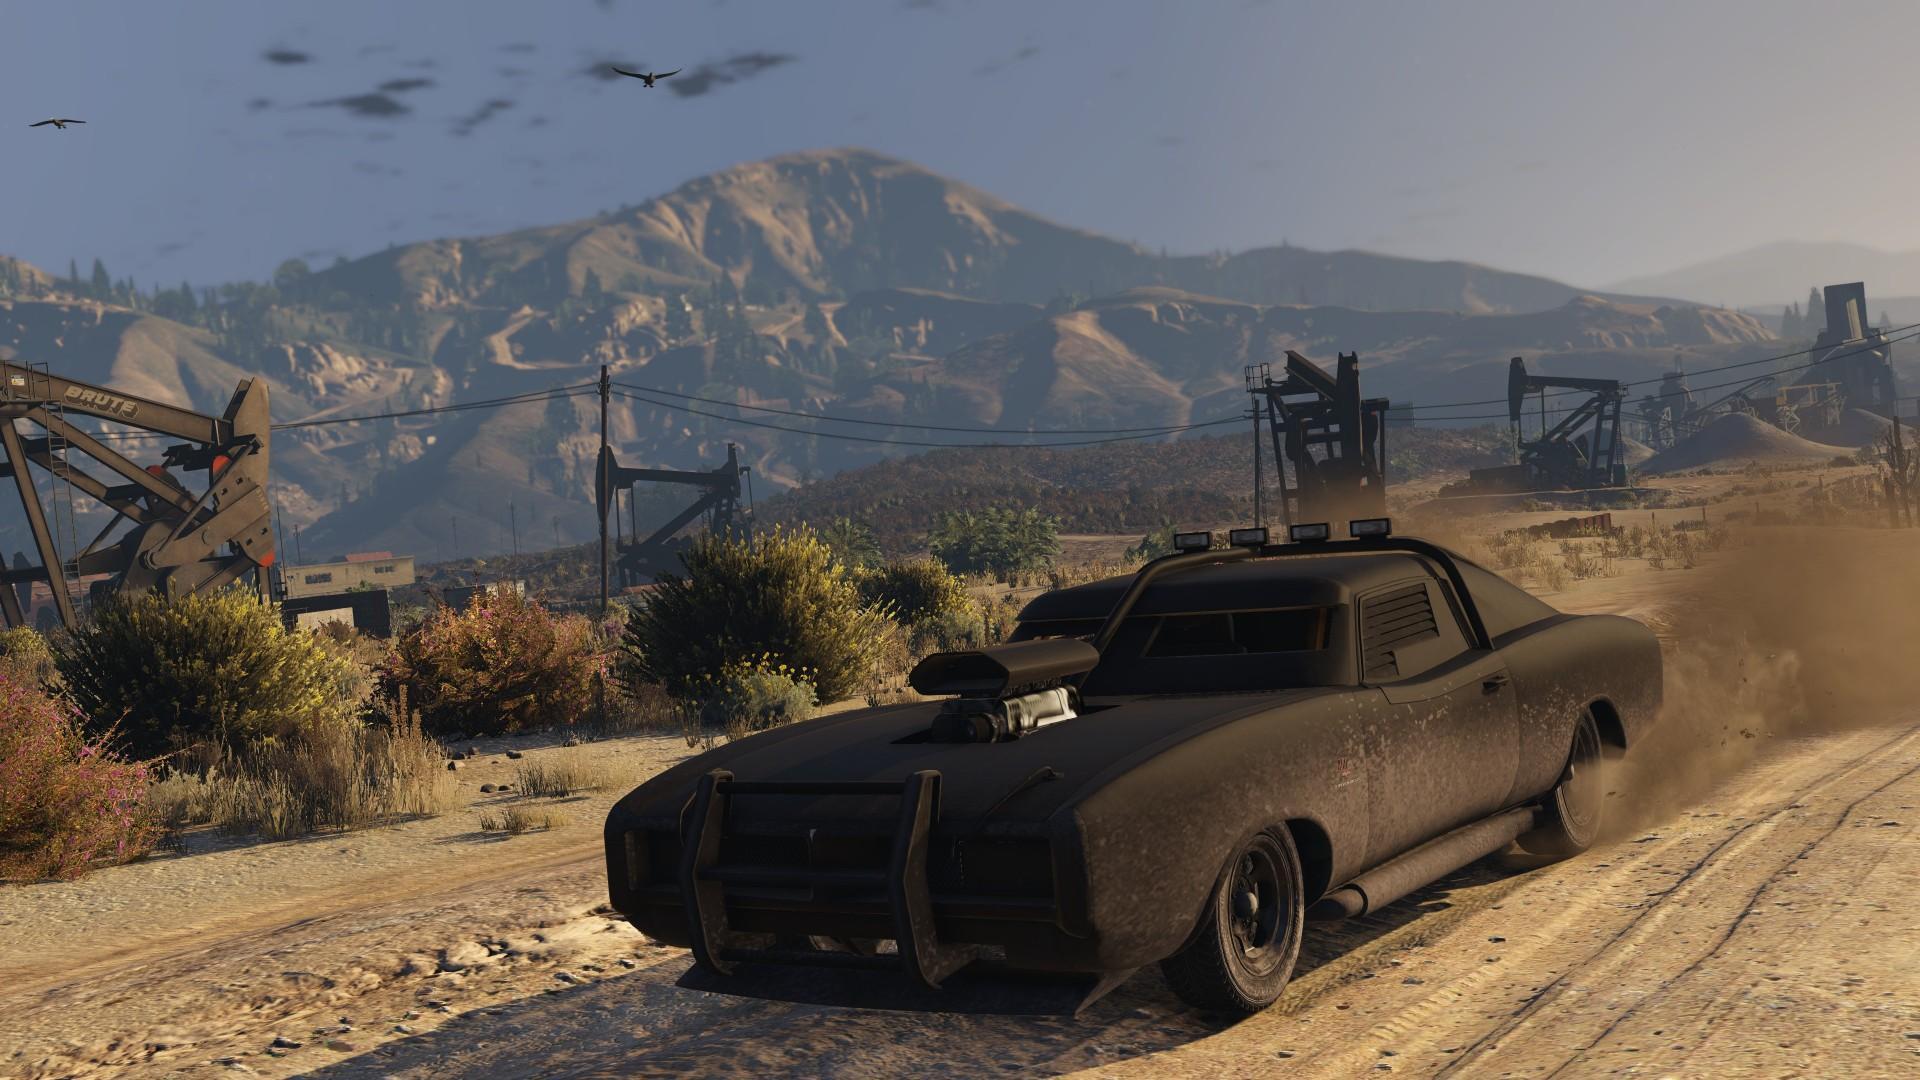 GTA V Screenshots for PS4, Xbox One & PC - Grand Theft Auto V